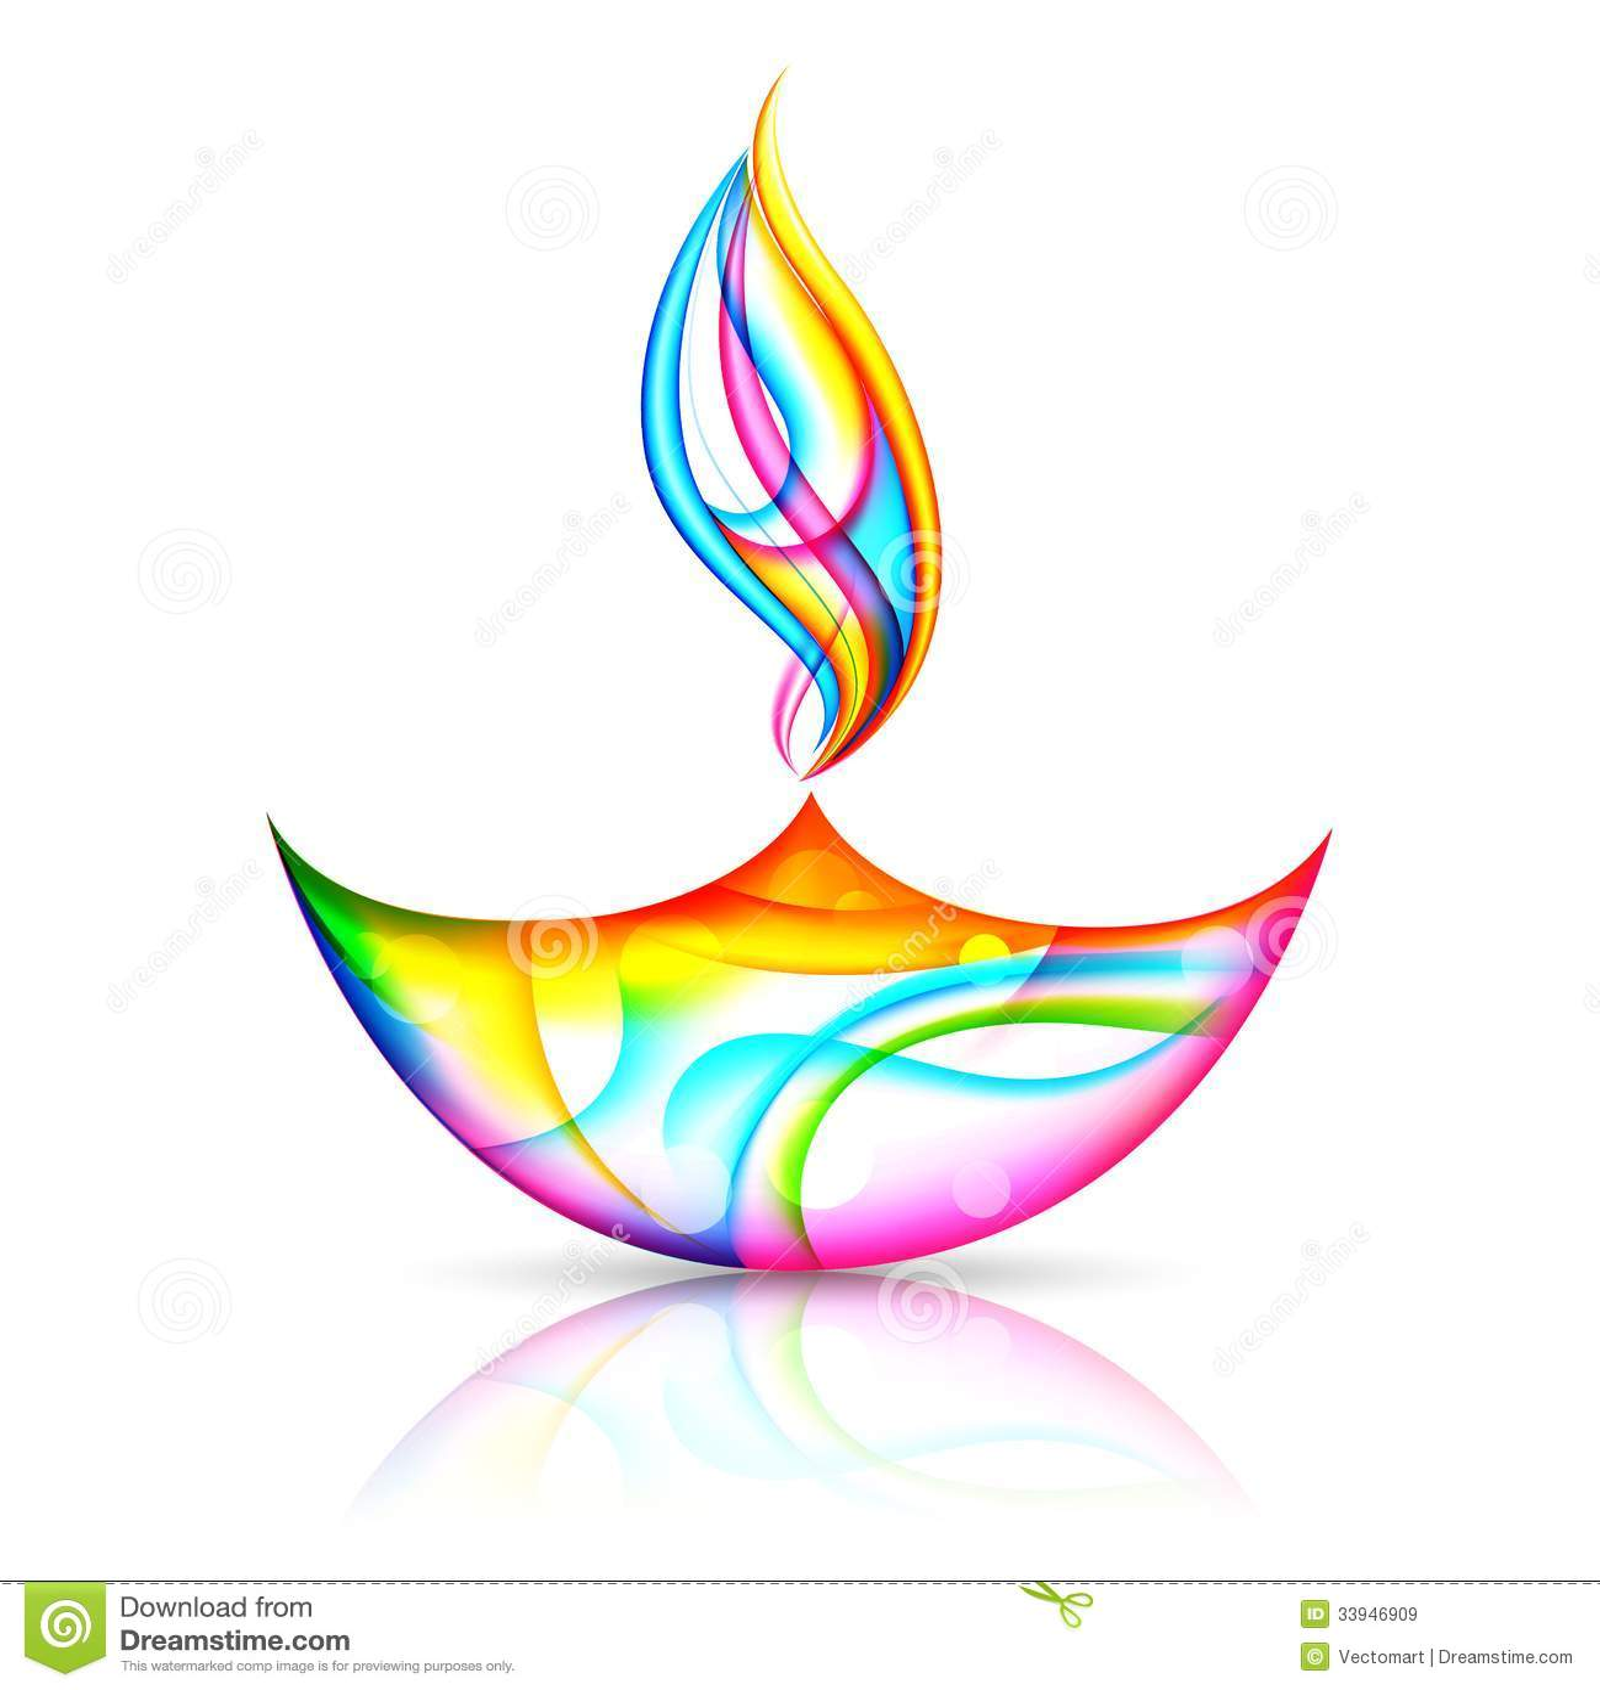 Happy Diwali 3d Wallpaper Happy Diwali Holiday Royalty Free Stock Images Image